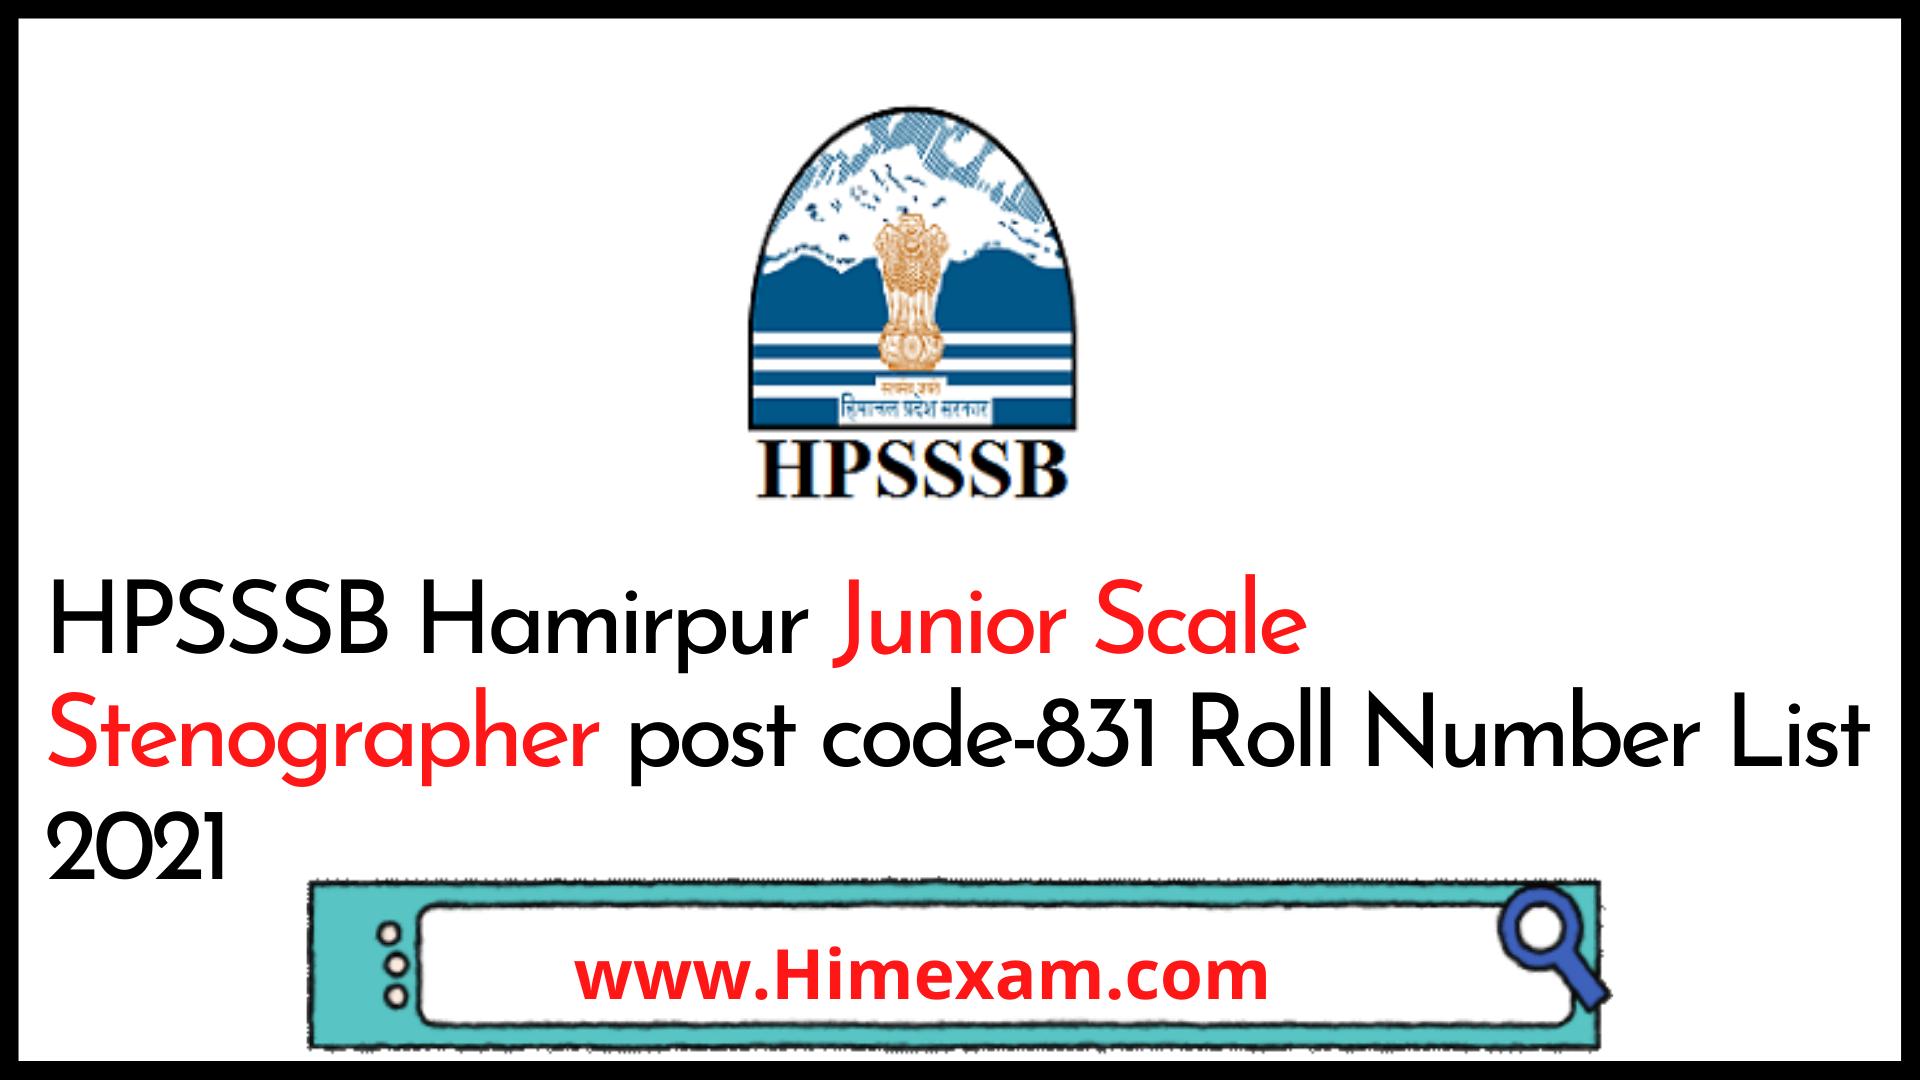 HPSSSB Hamirpur Junior Scale Stenographer post code-831 Roll Number List 2021